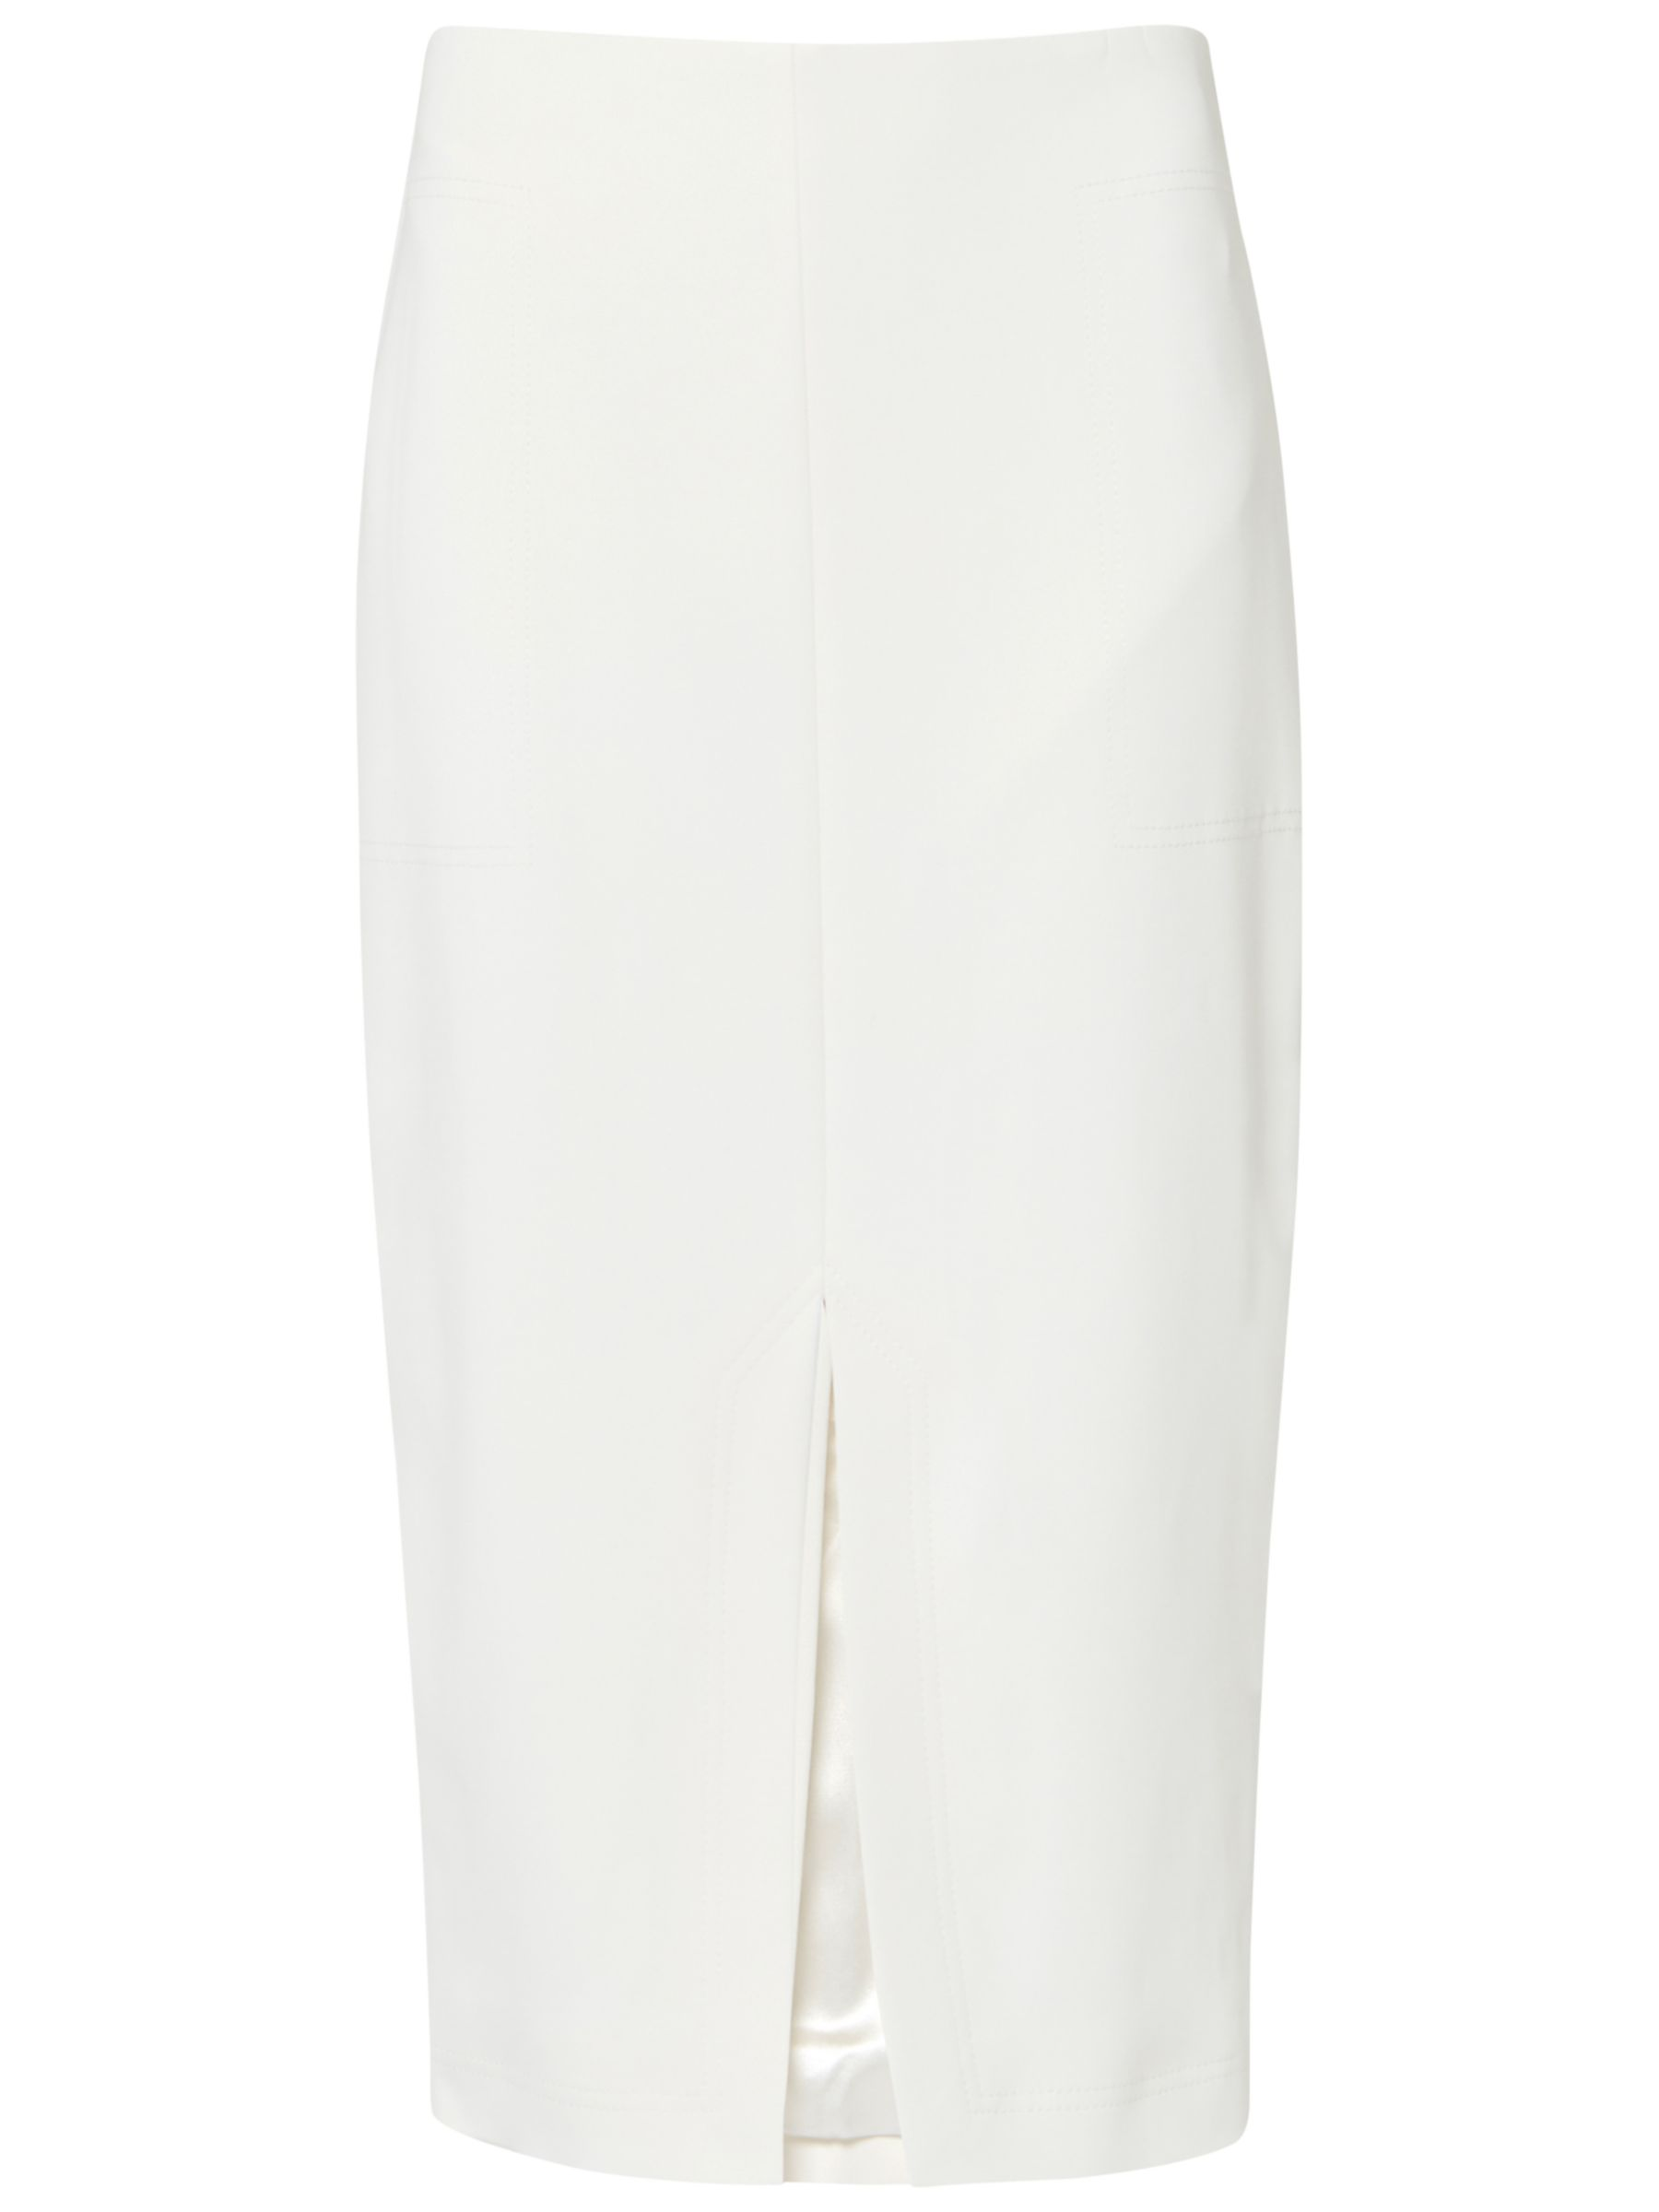 c3e37e709216ce Ted Baker Gemia High Waisted Pencil Skirt, Cream at John Lewis & Partners